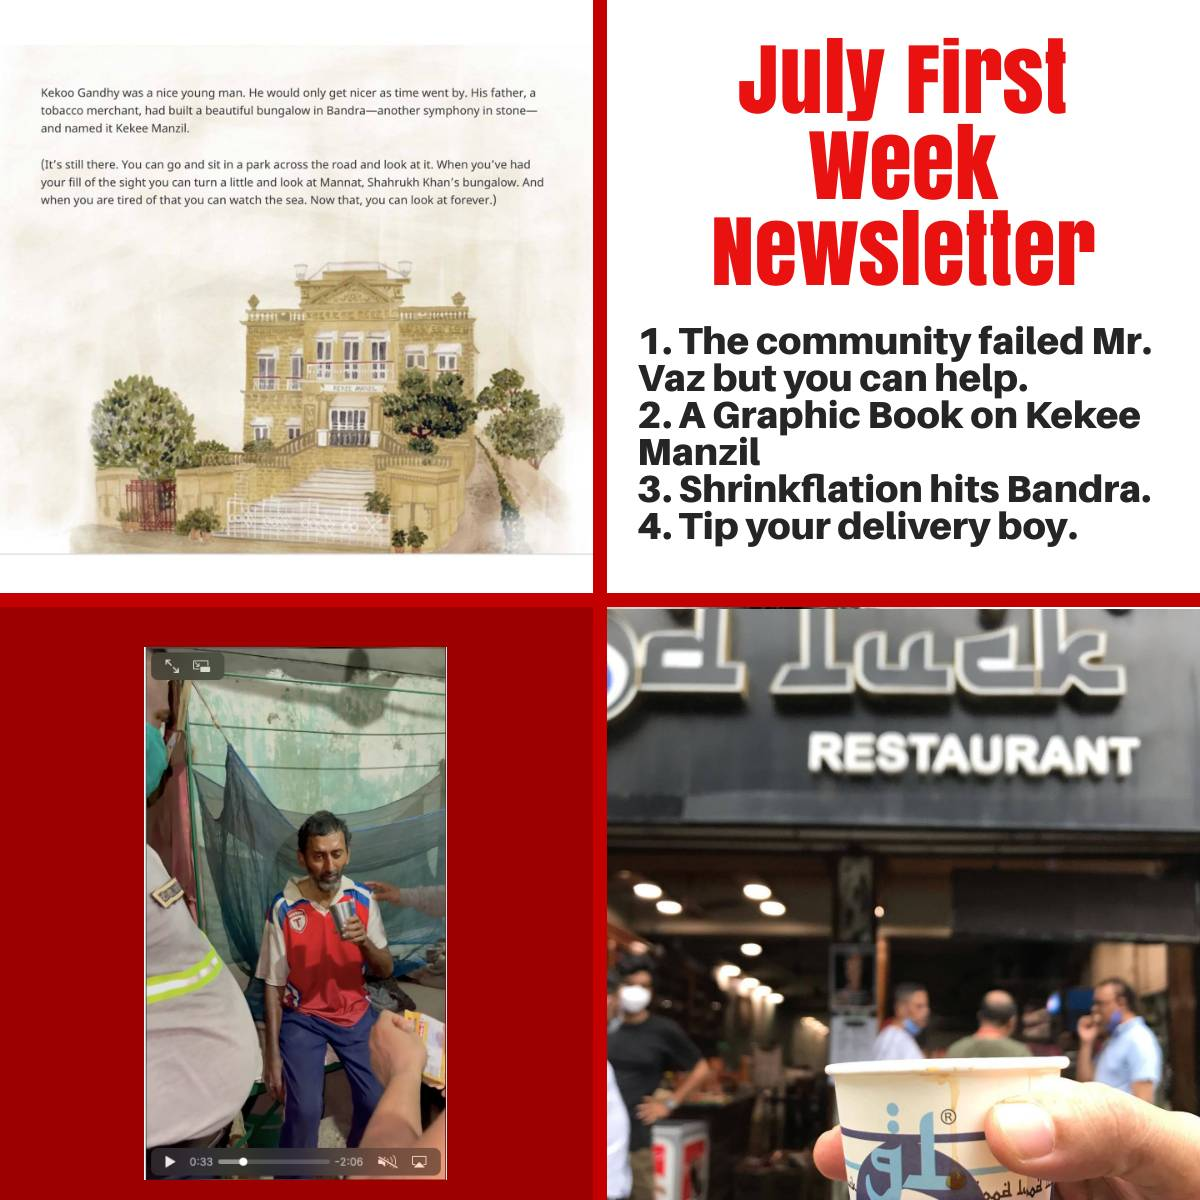 July First Week Newsletter